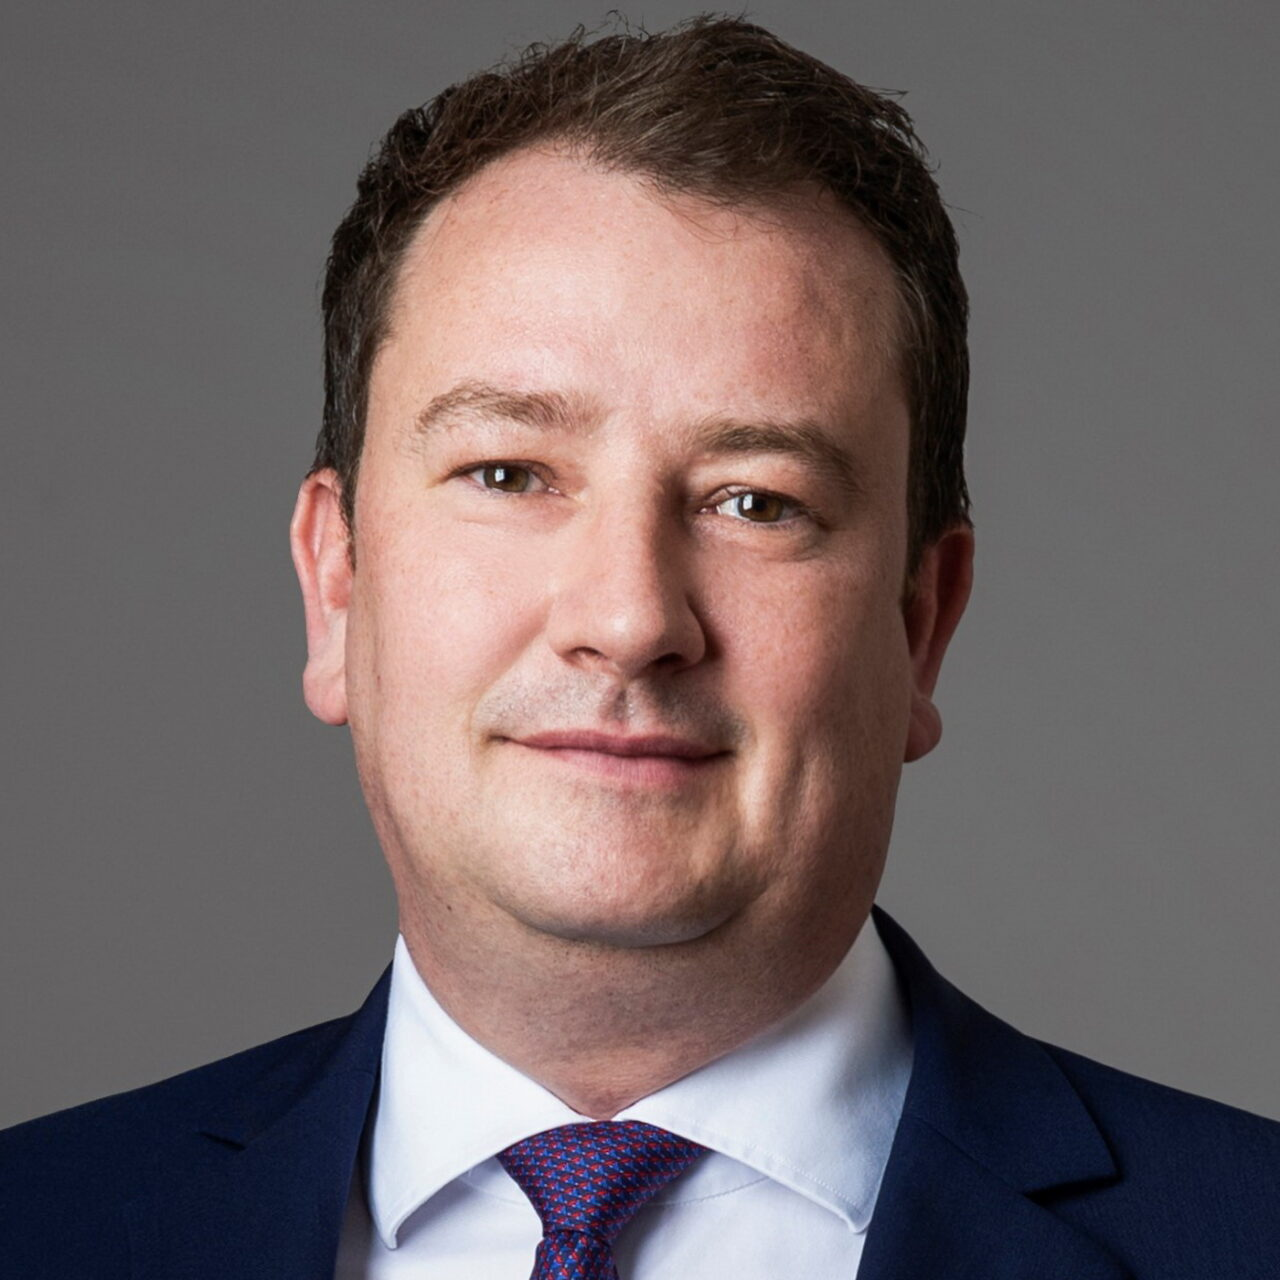 Michael Krzyzanek verantwortet ZBI-Fondsmanagement